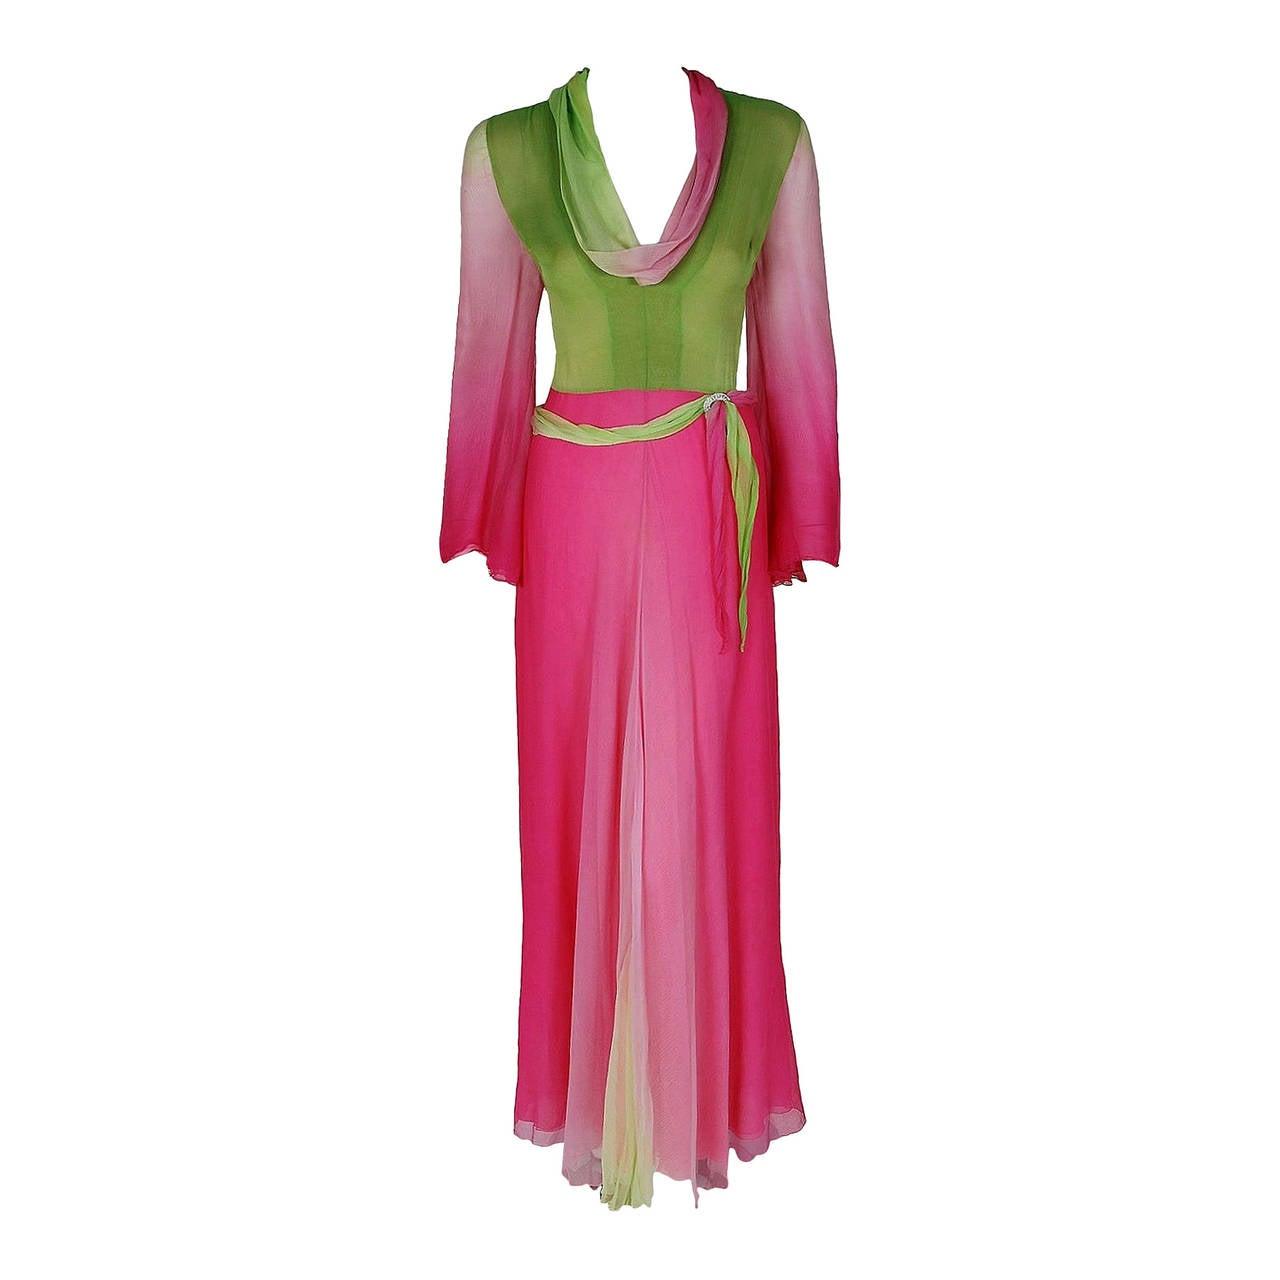 1970's Pauline Trigere Pink & Green Ombre Silk Chiffon Bell-Sleeve Goddess Gown 1